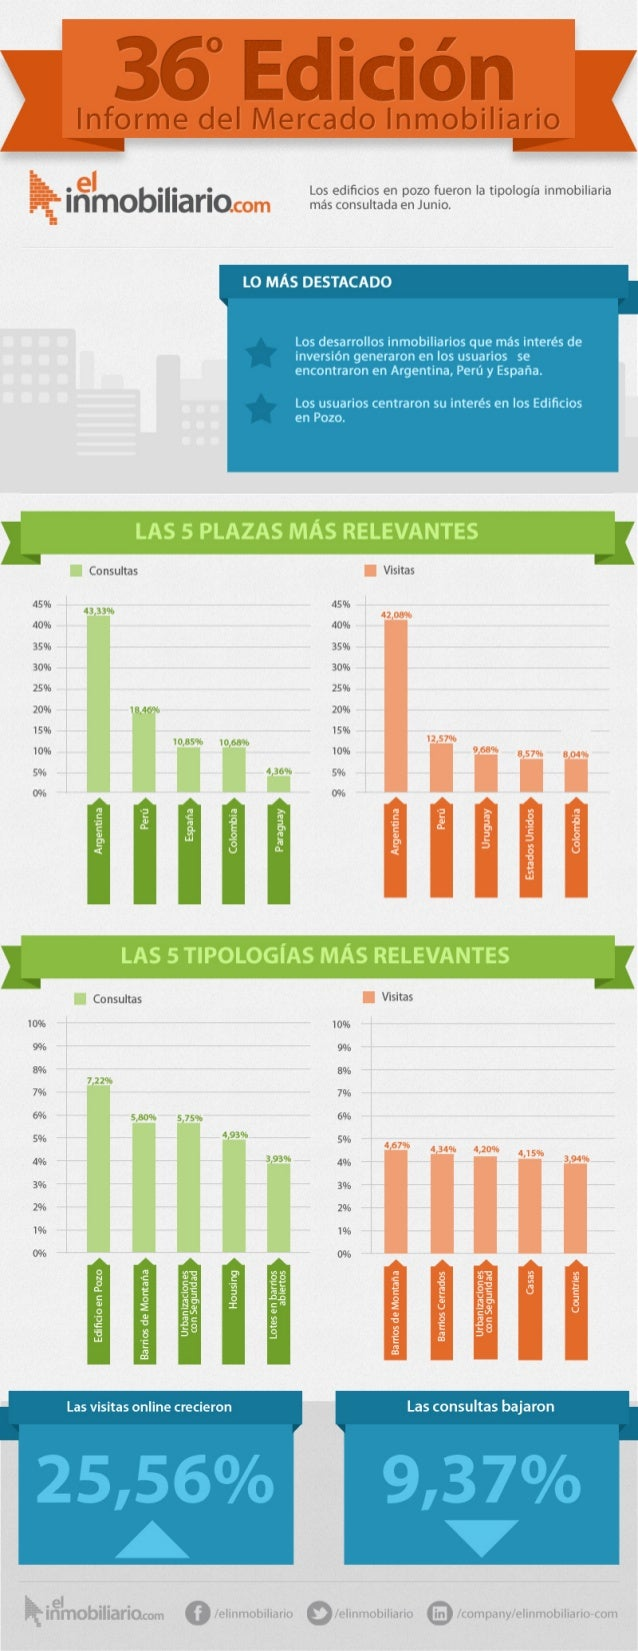 Informe mensual elinmobilario.com - Julio 2013